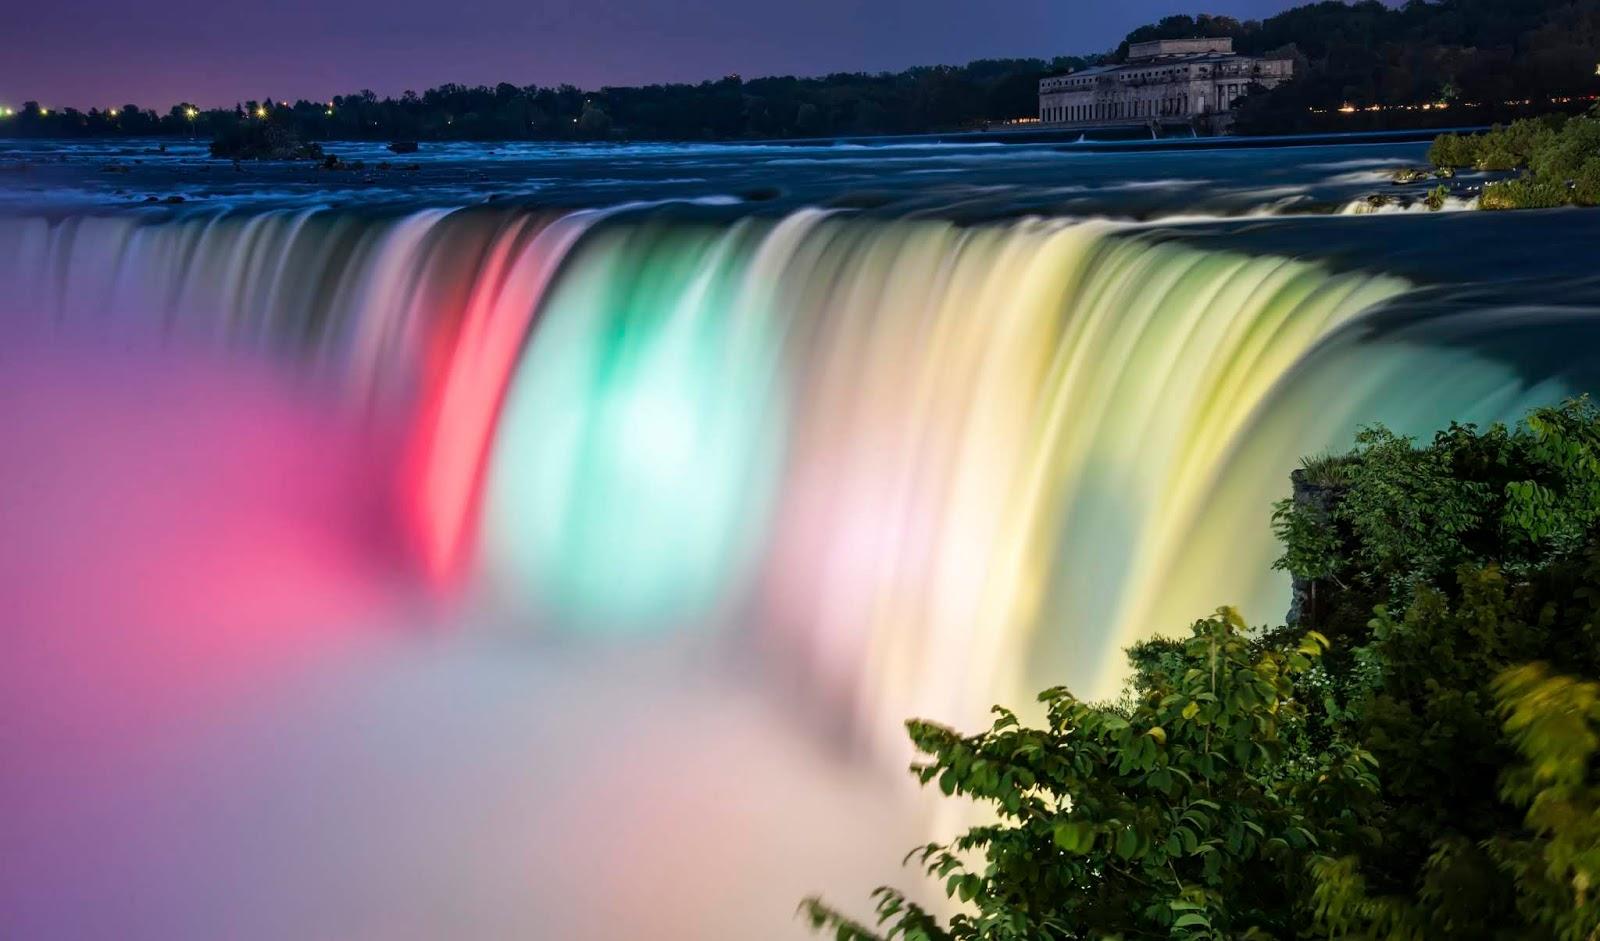 Niagara Falls Images HD Free Download